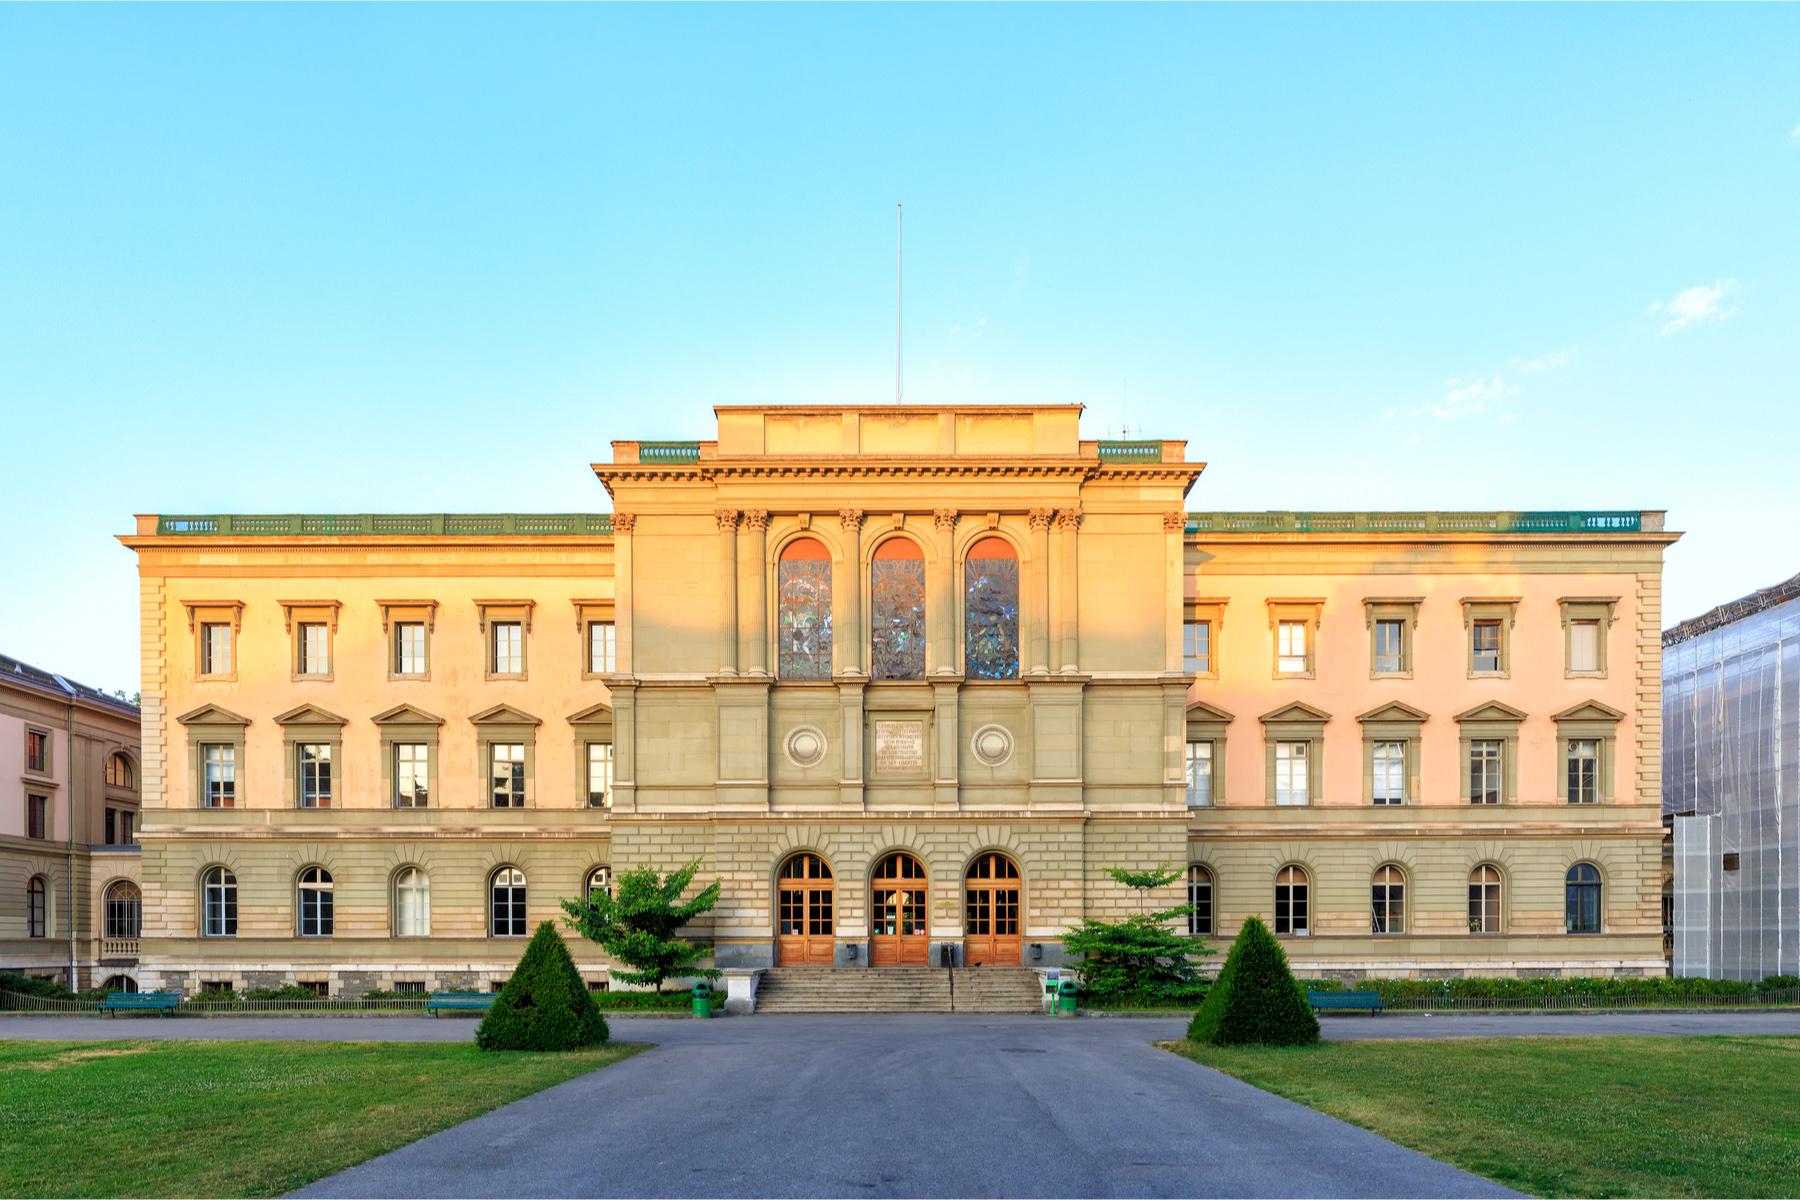 University of Geneva library